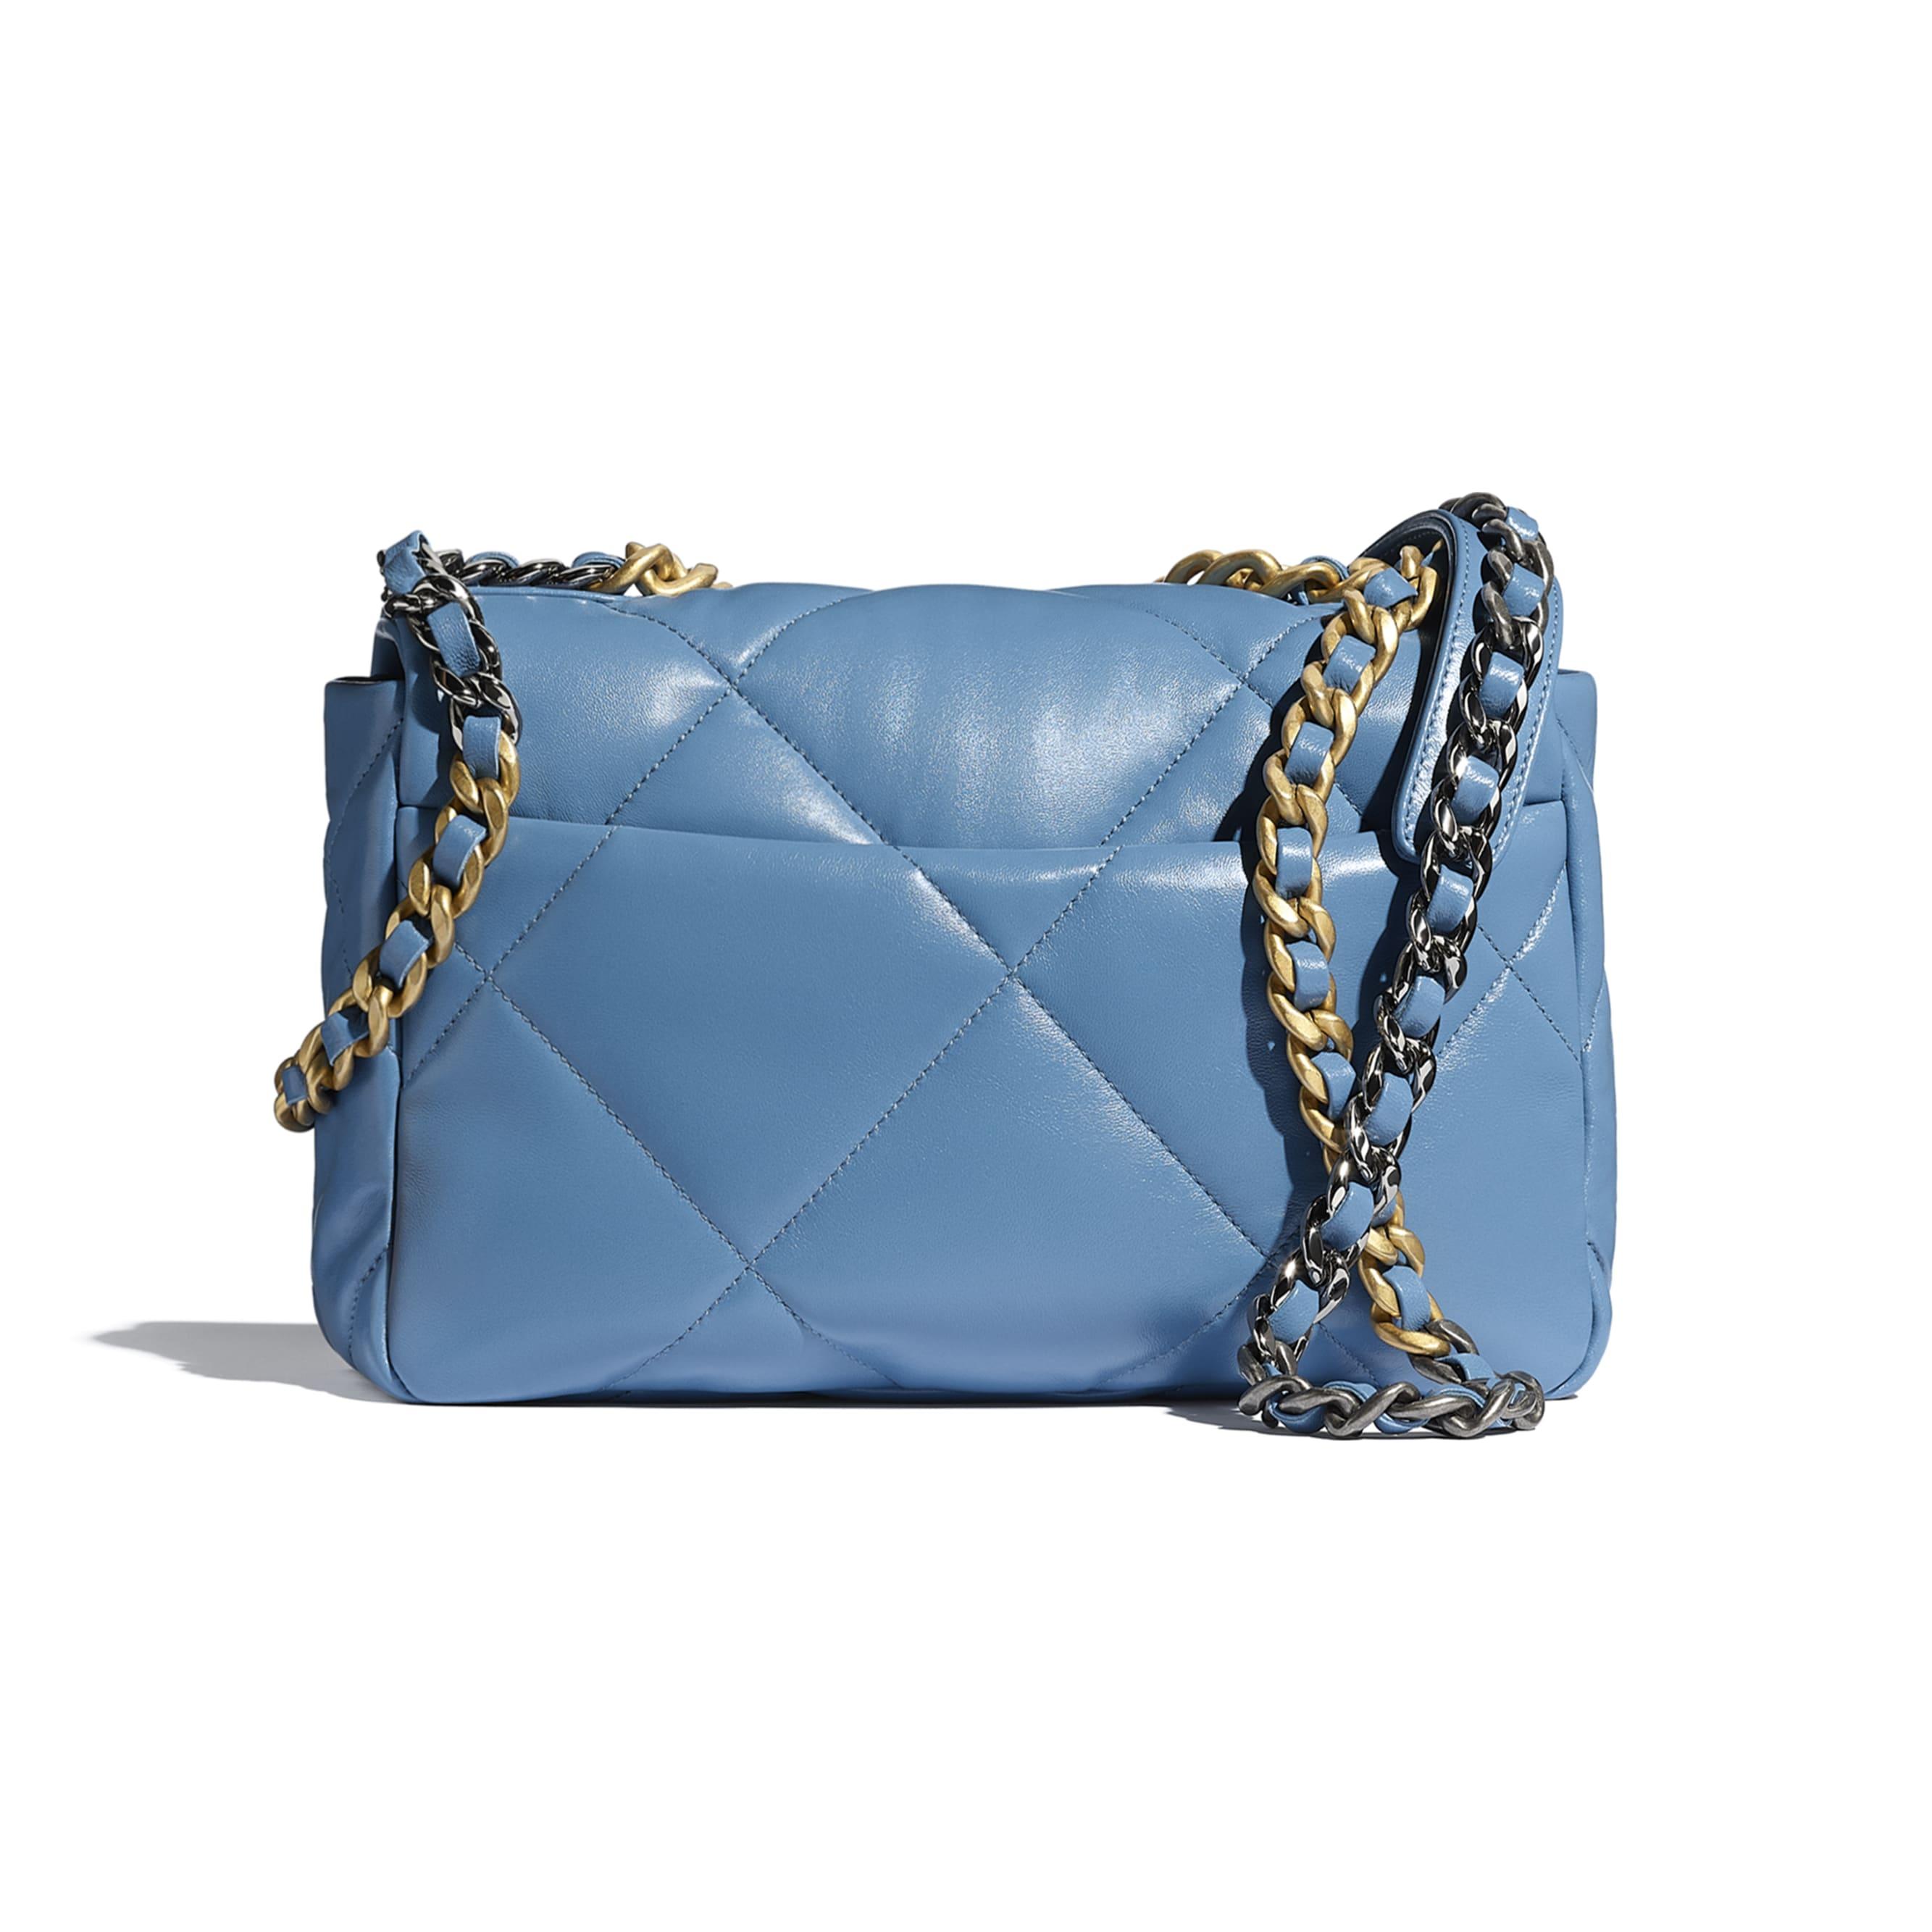 CHANEL 19 Handbag - Blue - Lambskin, Gold-Tone, Silver-Tone & Ruthenium-Finish Metal - CHANEL - Alternative view - see standard sized version